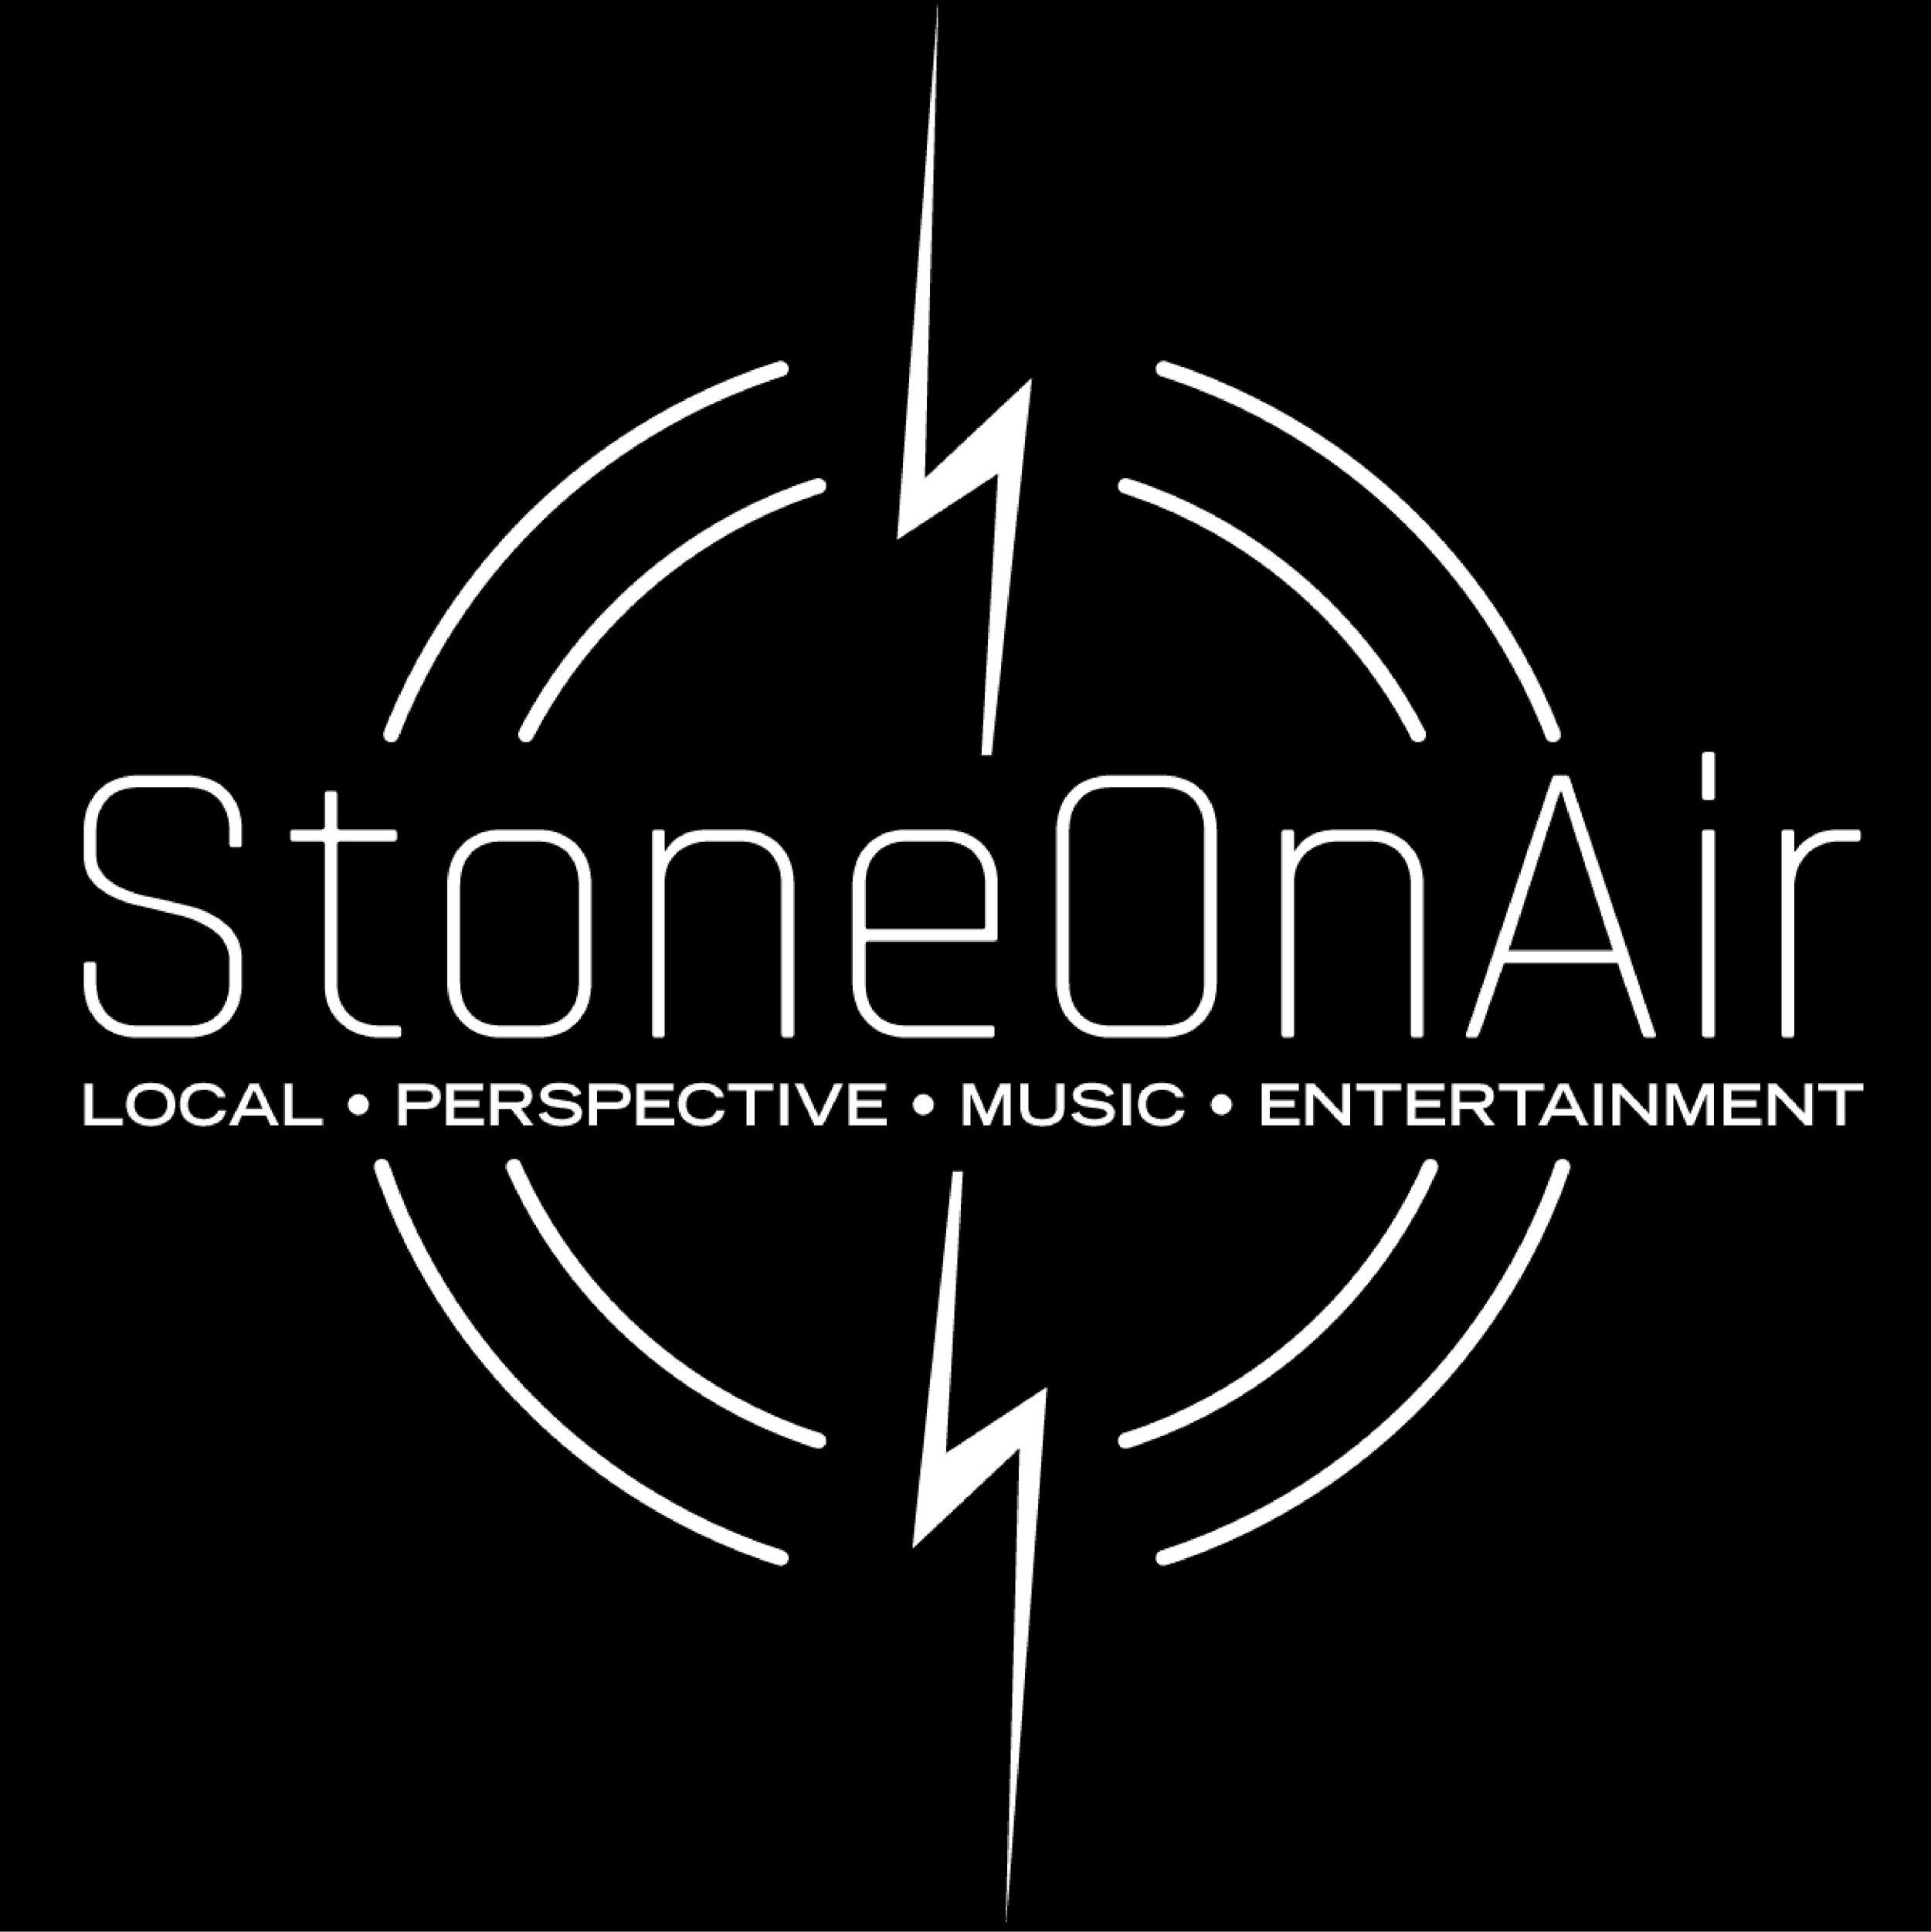 stoneonair_logopng.jpg